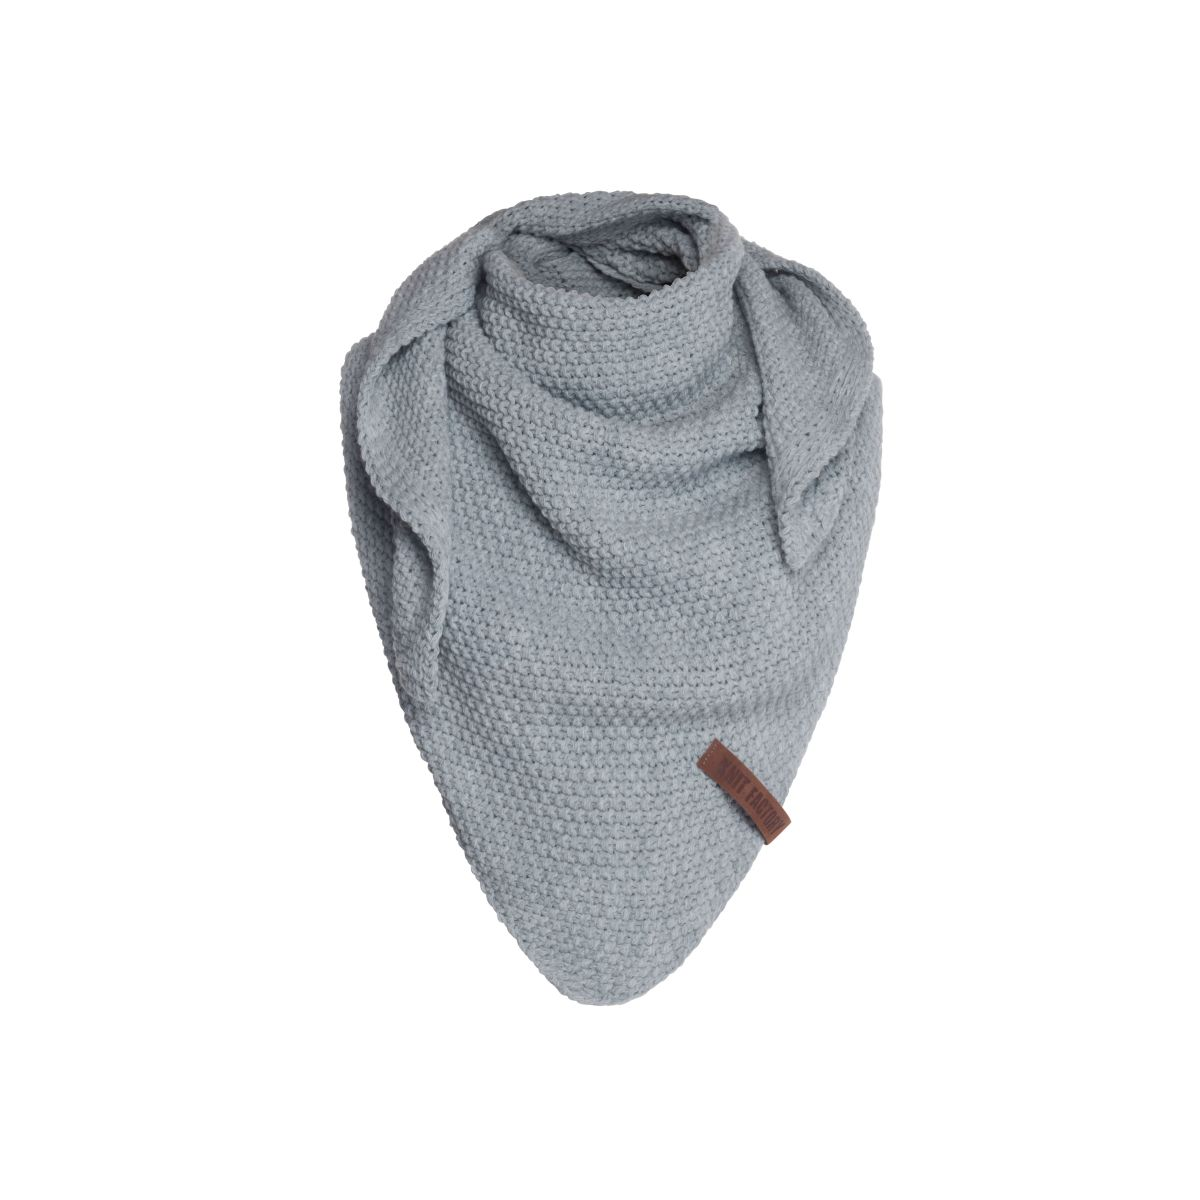 knit factory 1205911 coco omslagdoek junior grijs 1